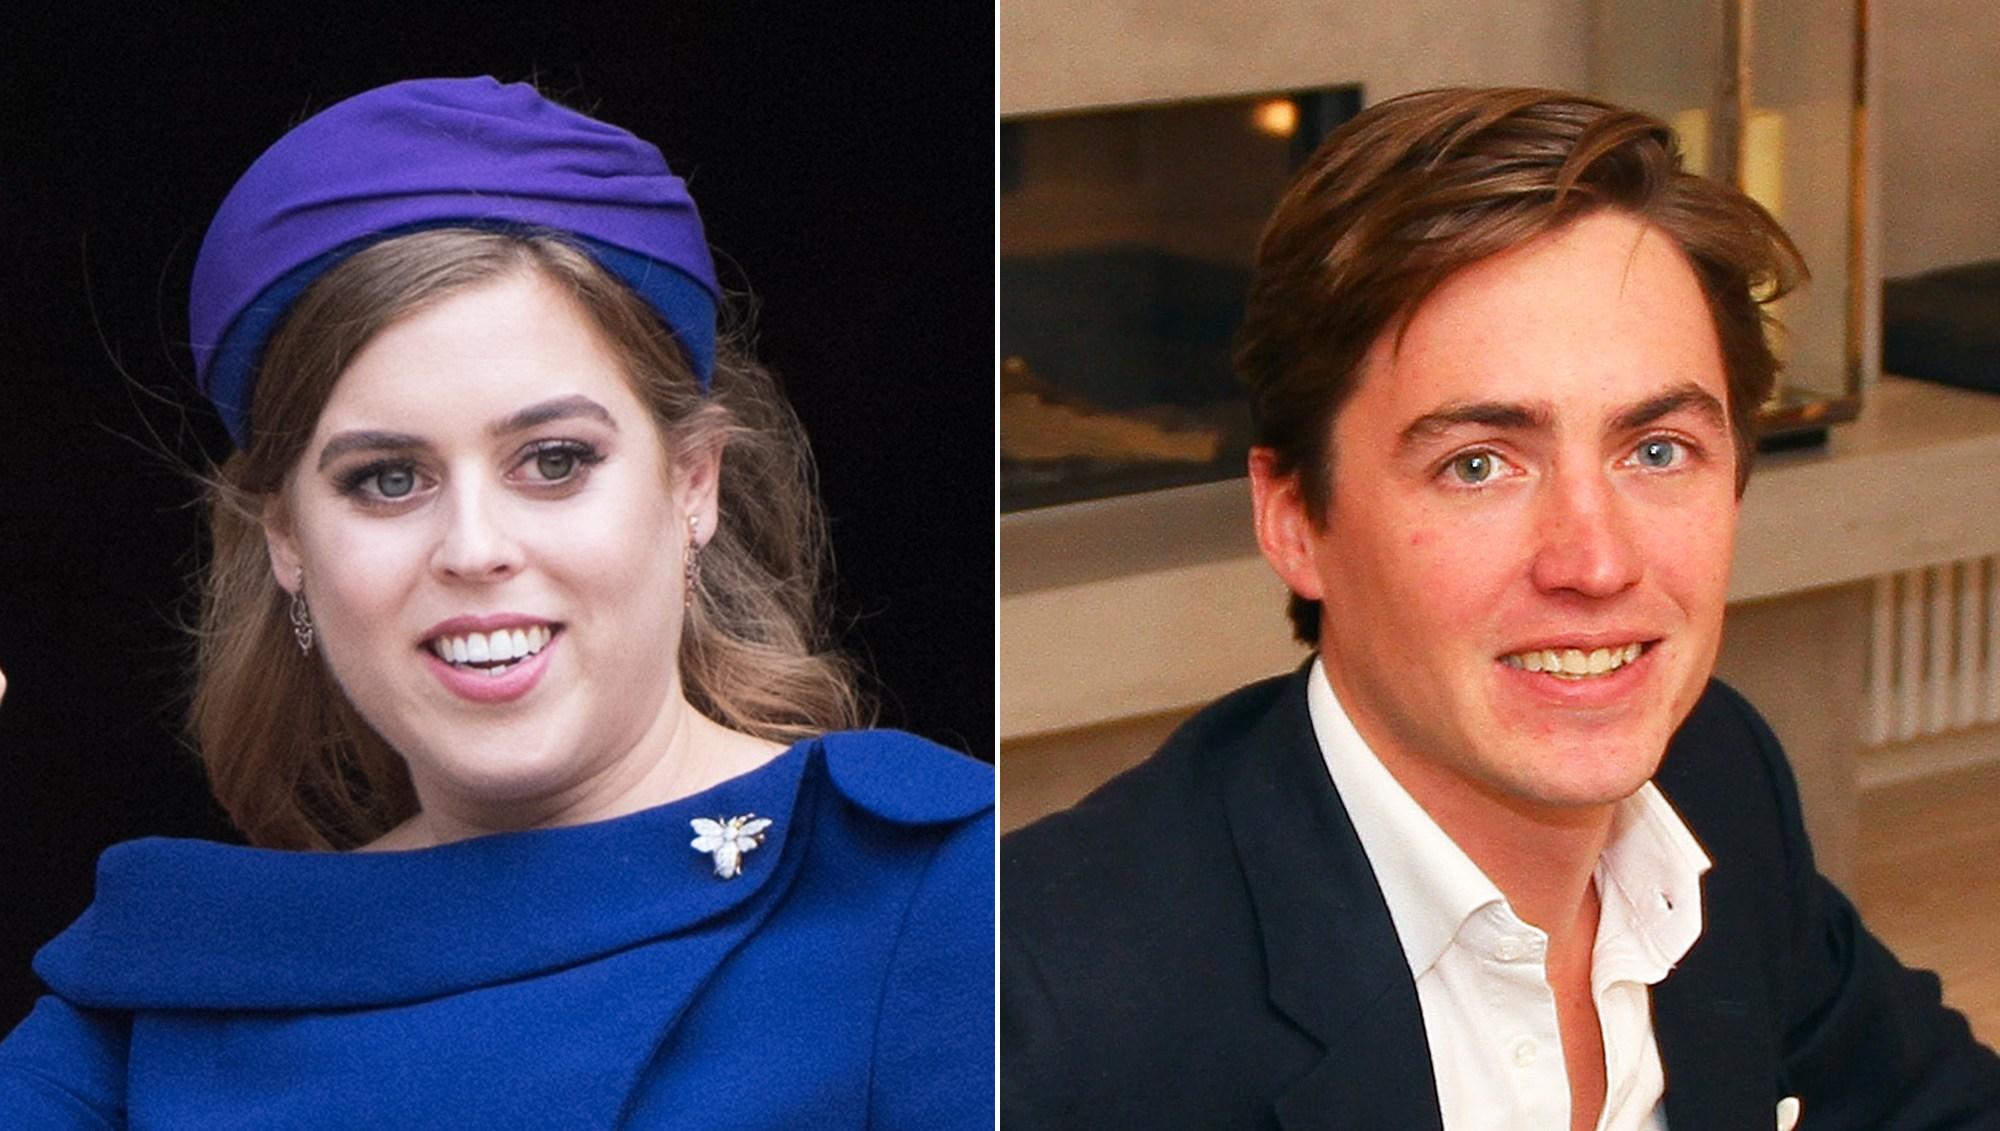 Princess Beatrice Is Dating Multimillionaire Divorcee Edoardo Mapelli Mozzi